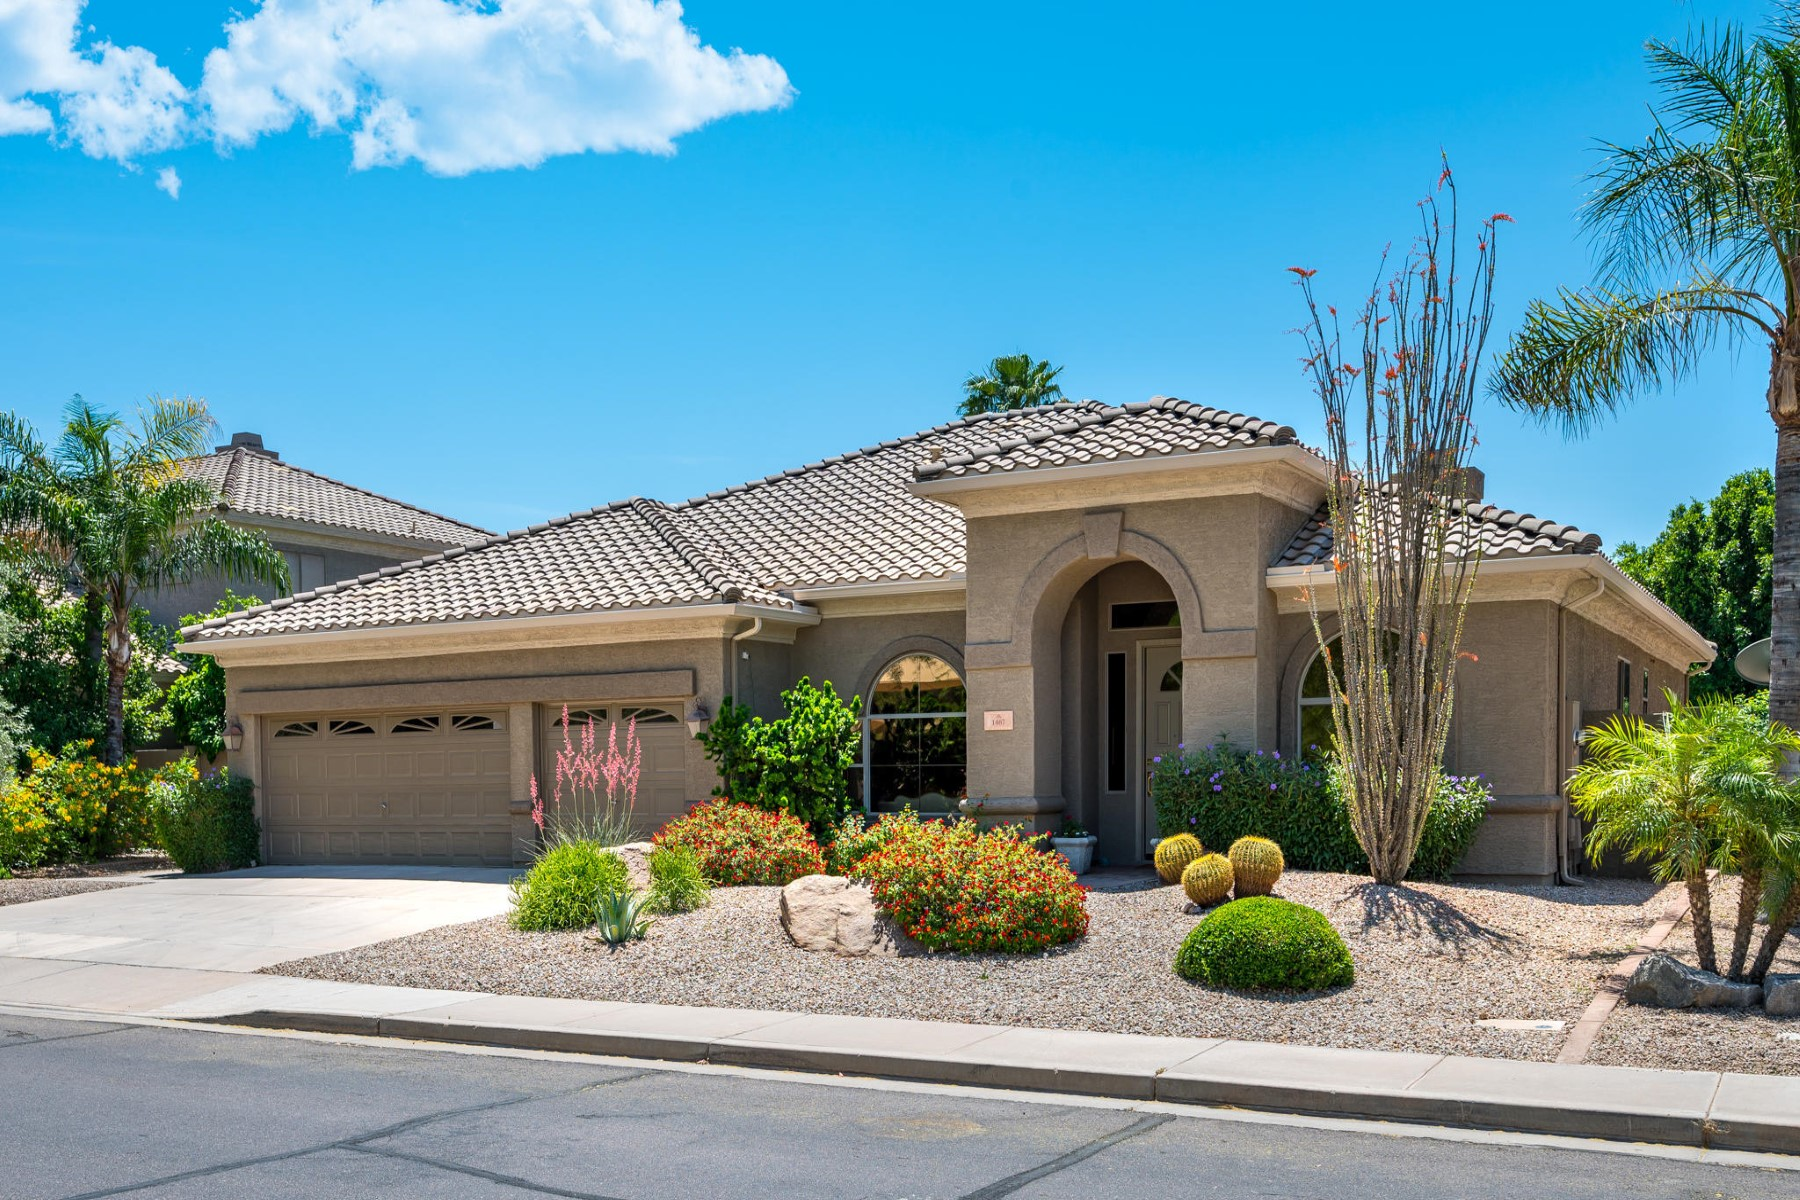 Single Family Homes για την Πώληση στο Silverstone Ranch 1467 E RAWHIDE AVE, Gilbert, Αριζονα 85296 Ηνωμένες Πολιτείες